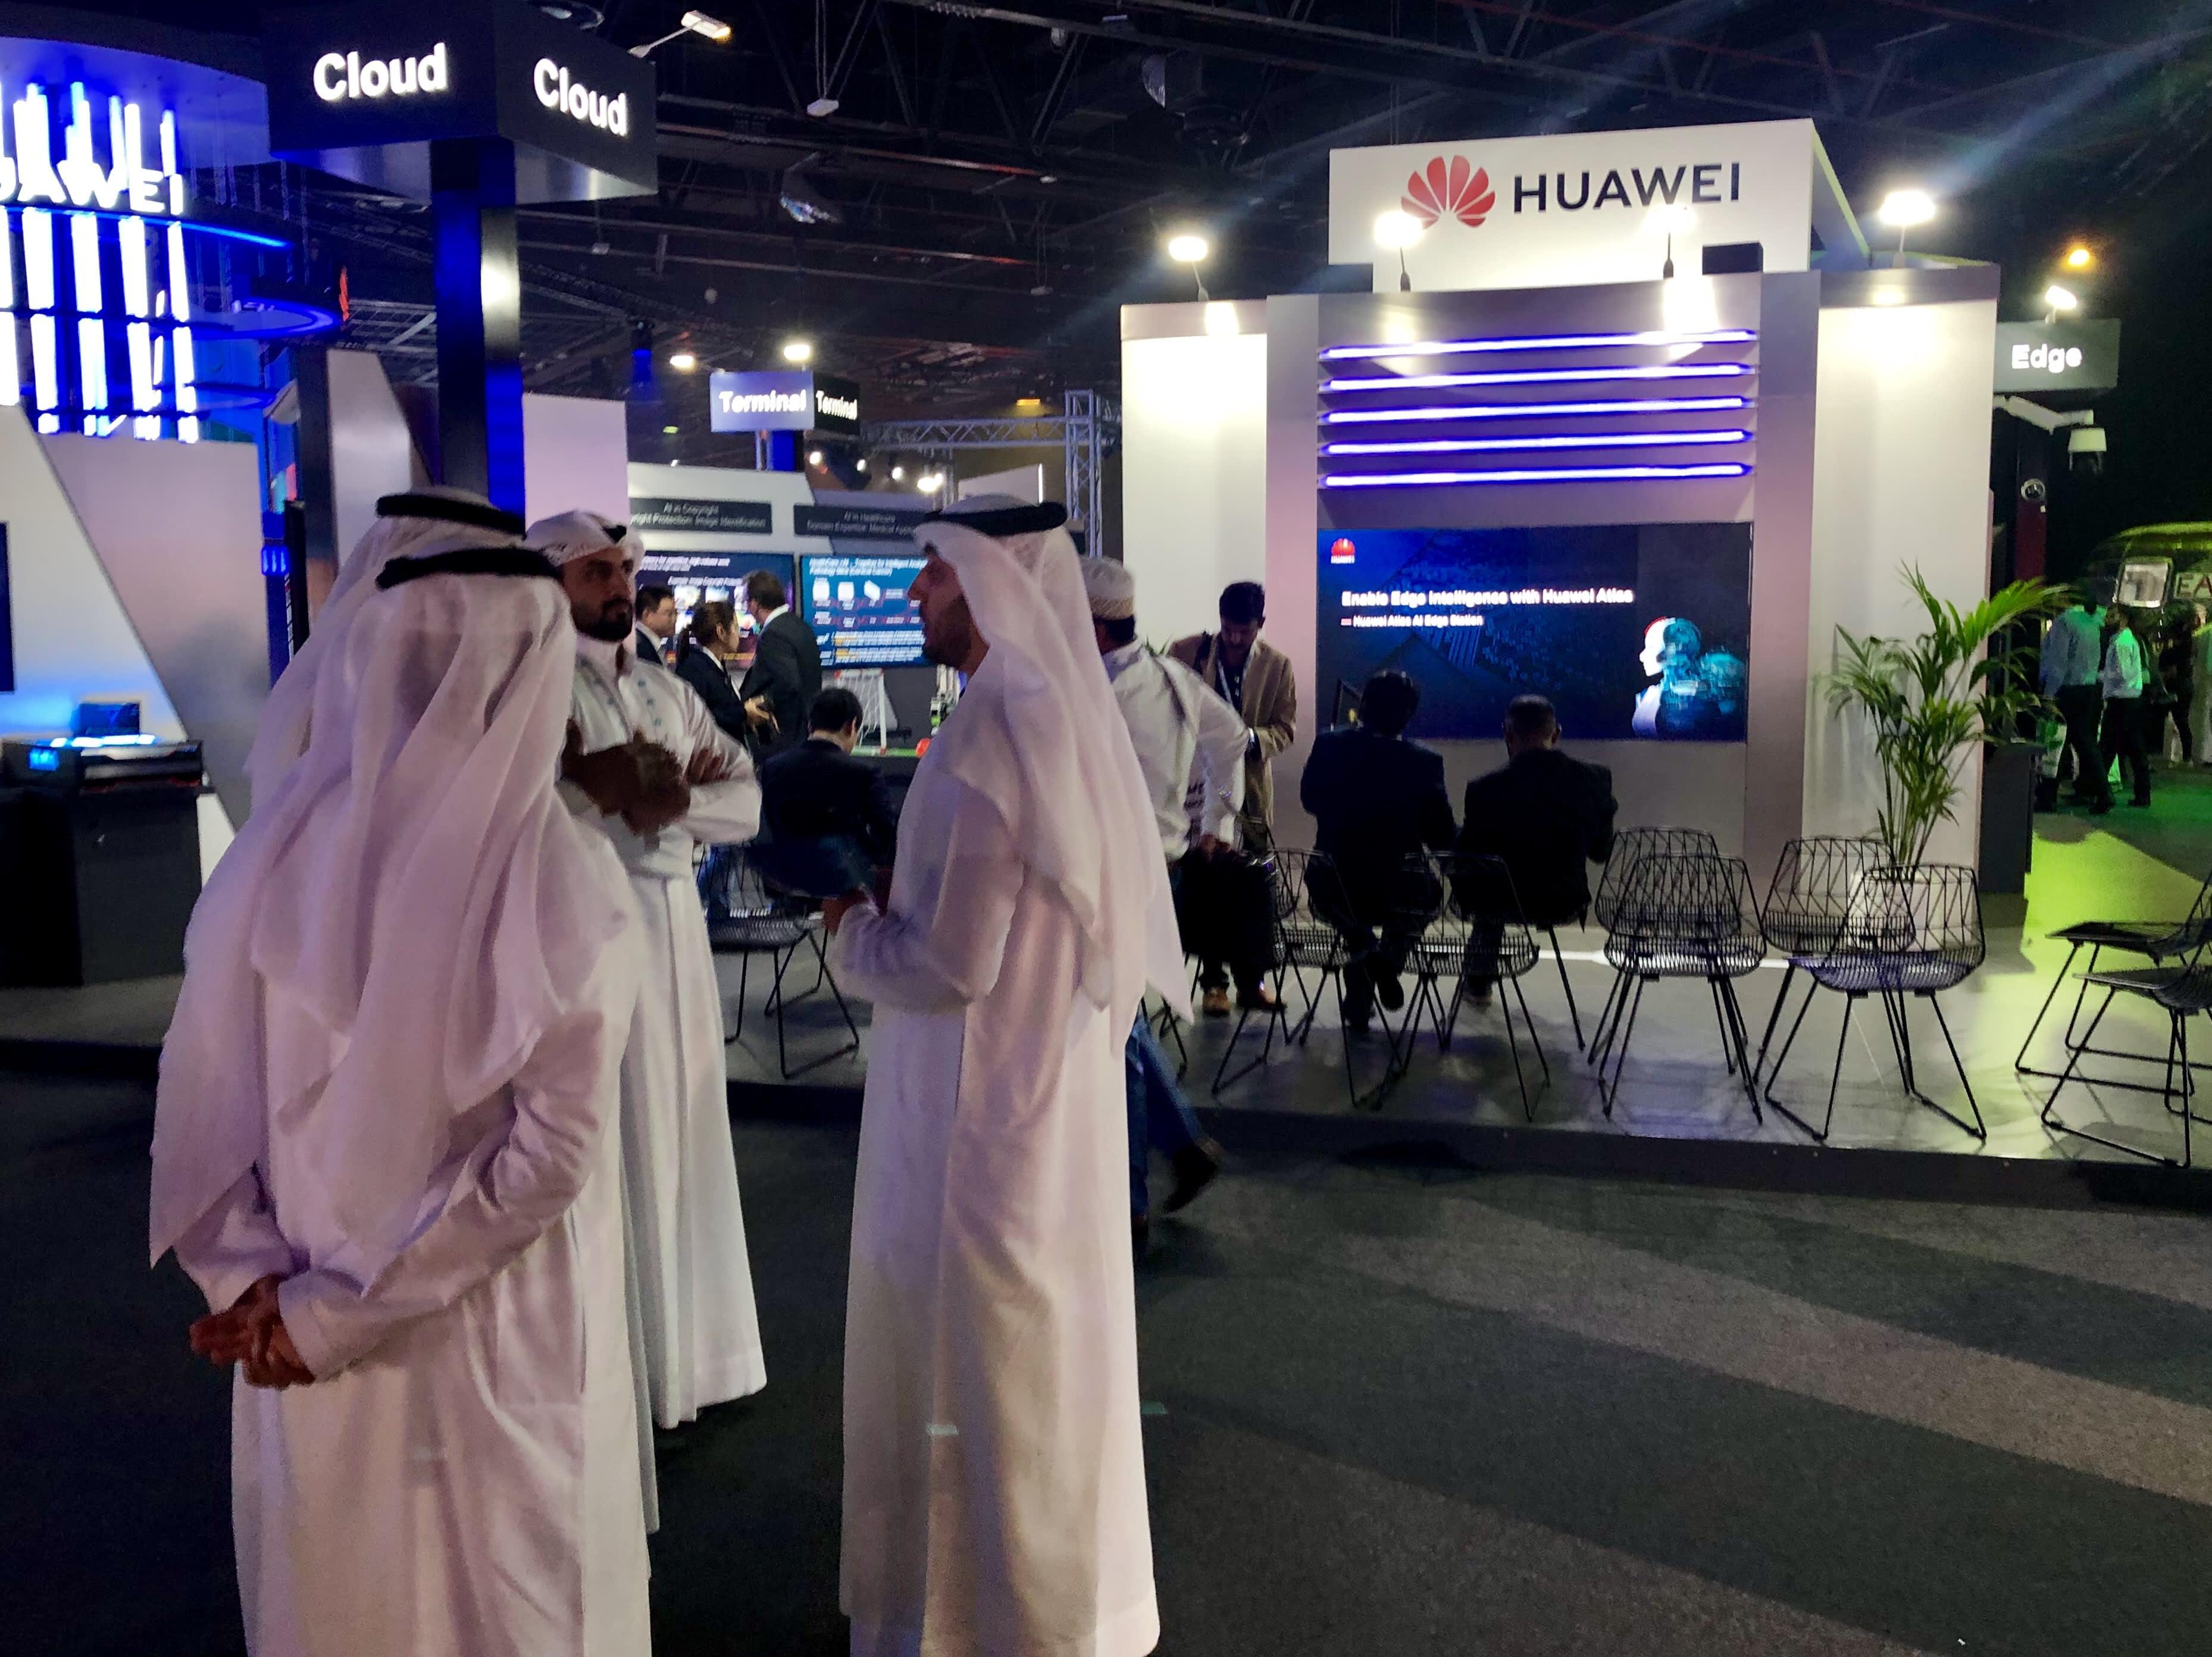 Attendees at Dubai's inaugural AI Everything summit walk among exhibitor stands. Dubai, United Arab Emirates, May 1, 2019.